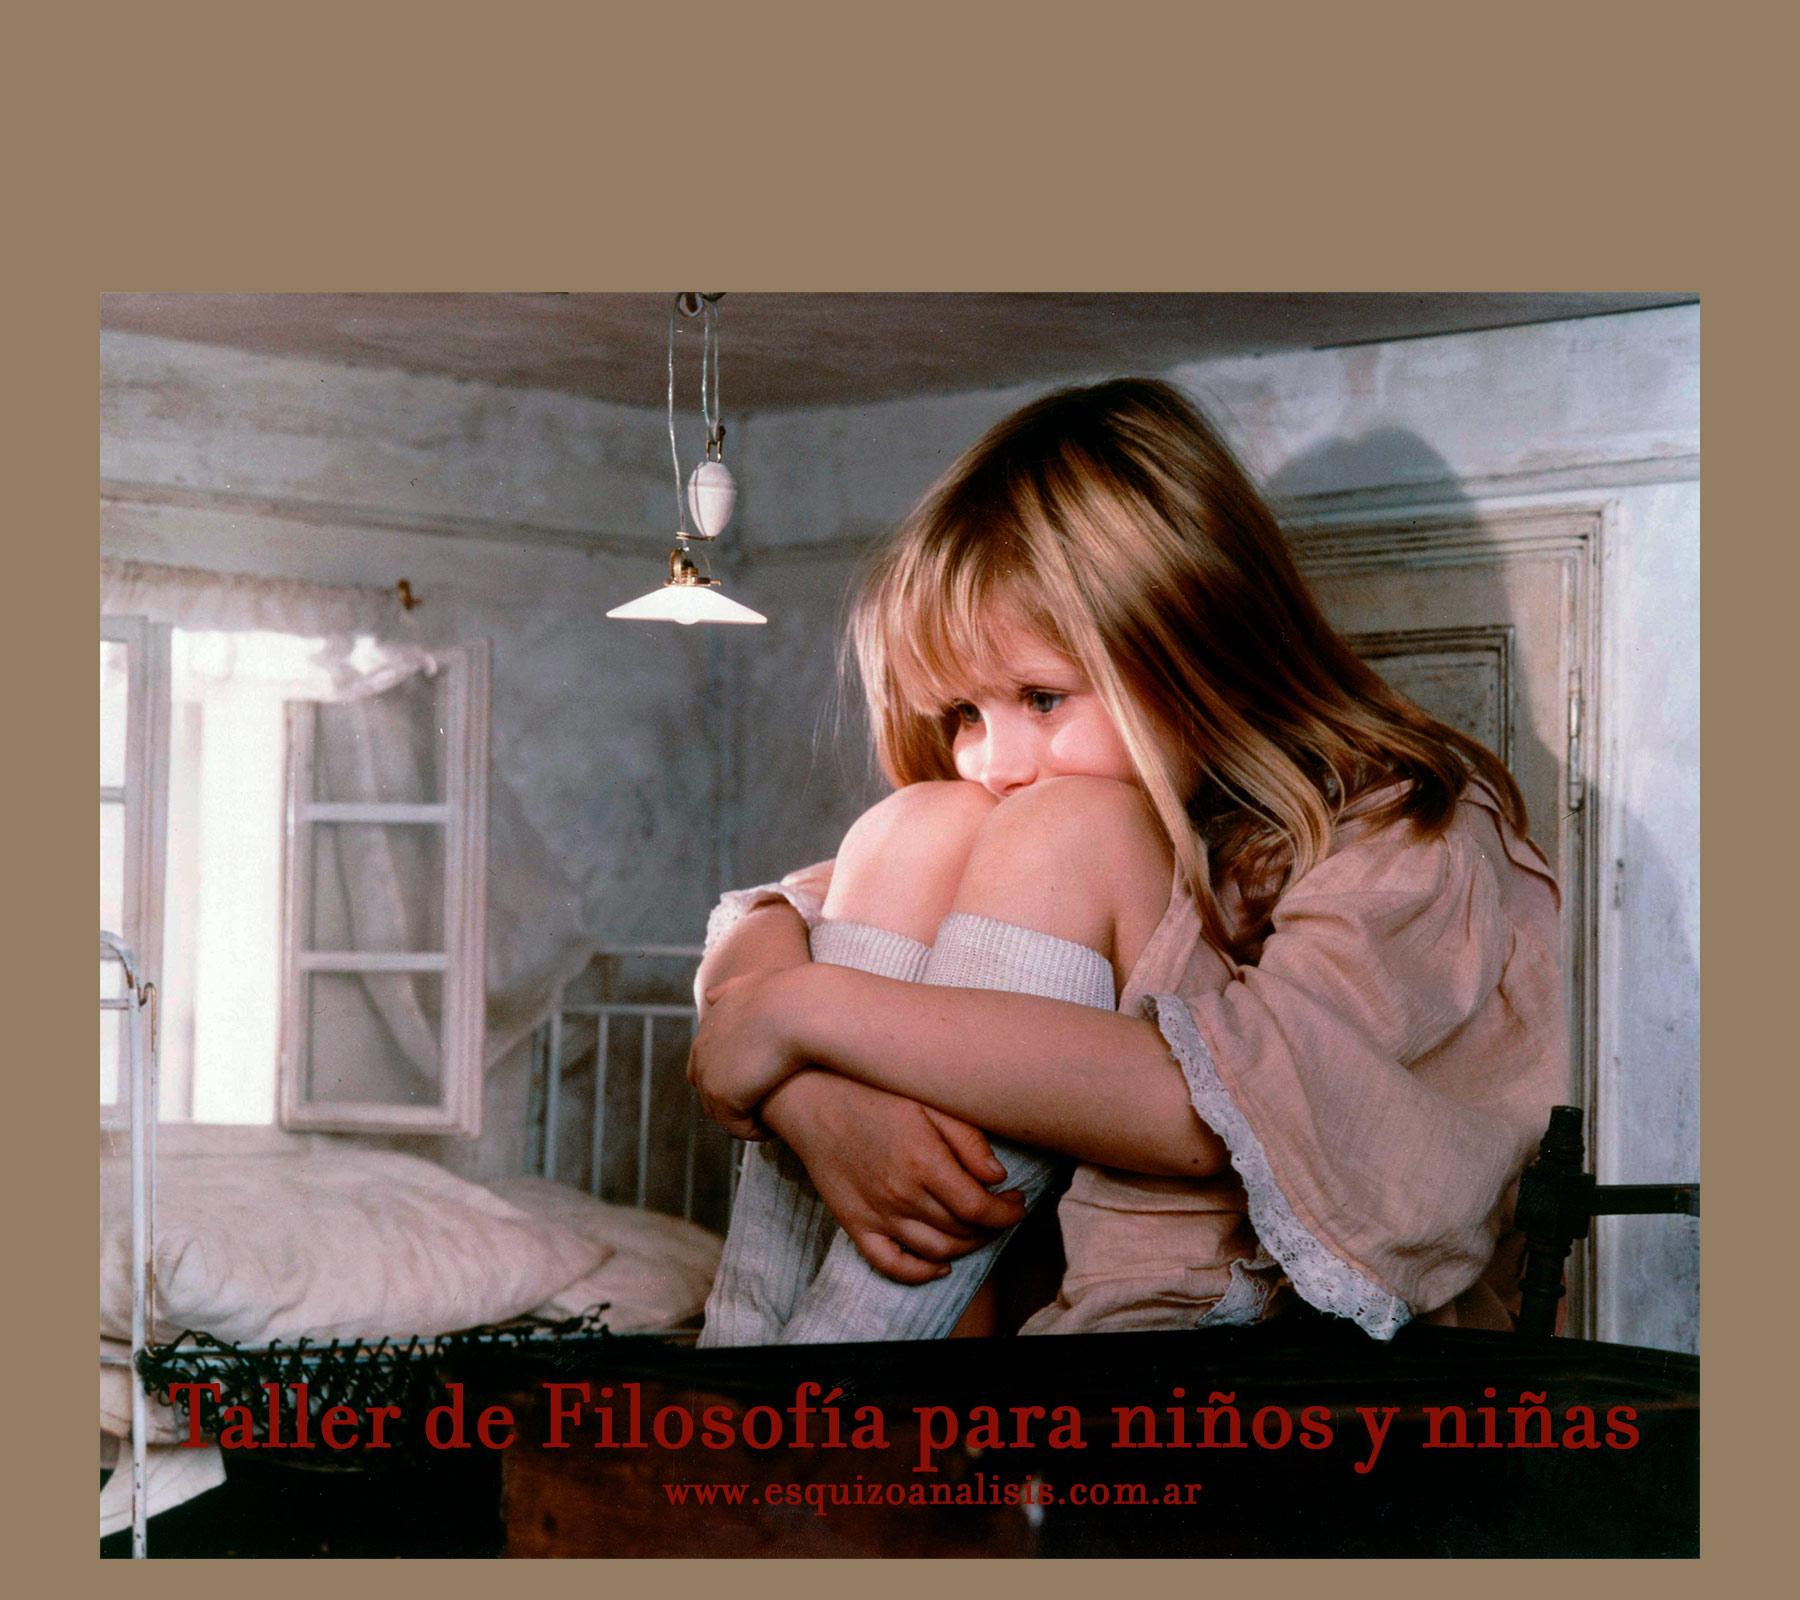 http://www.medicinayarte.com/img/taller-de-filosofia-para-ninos2.jpg